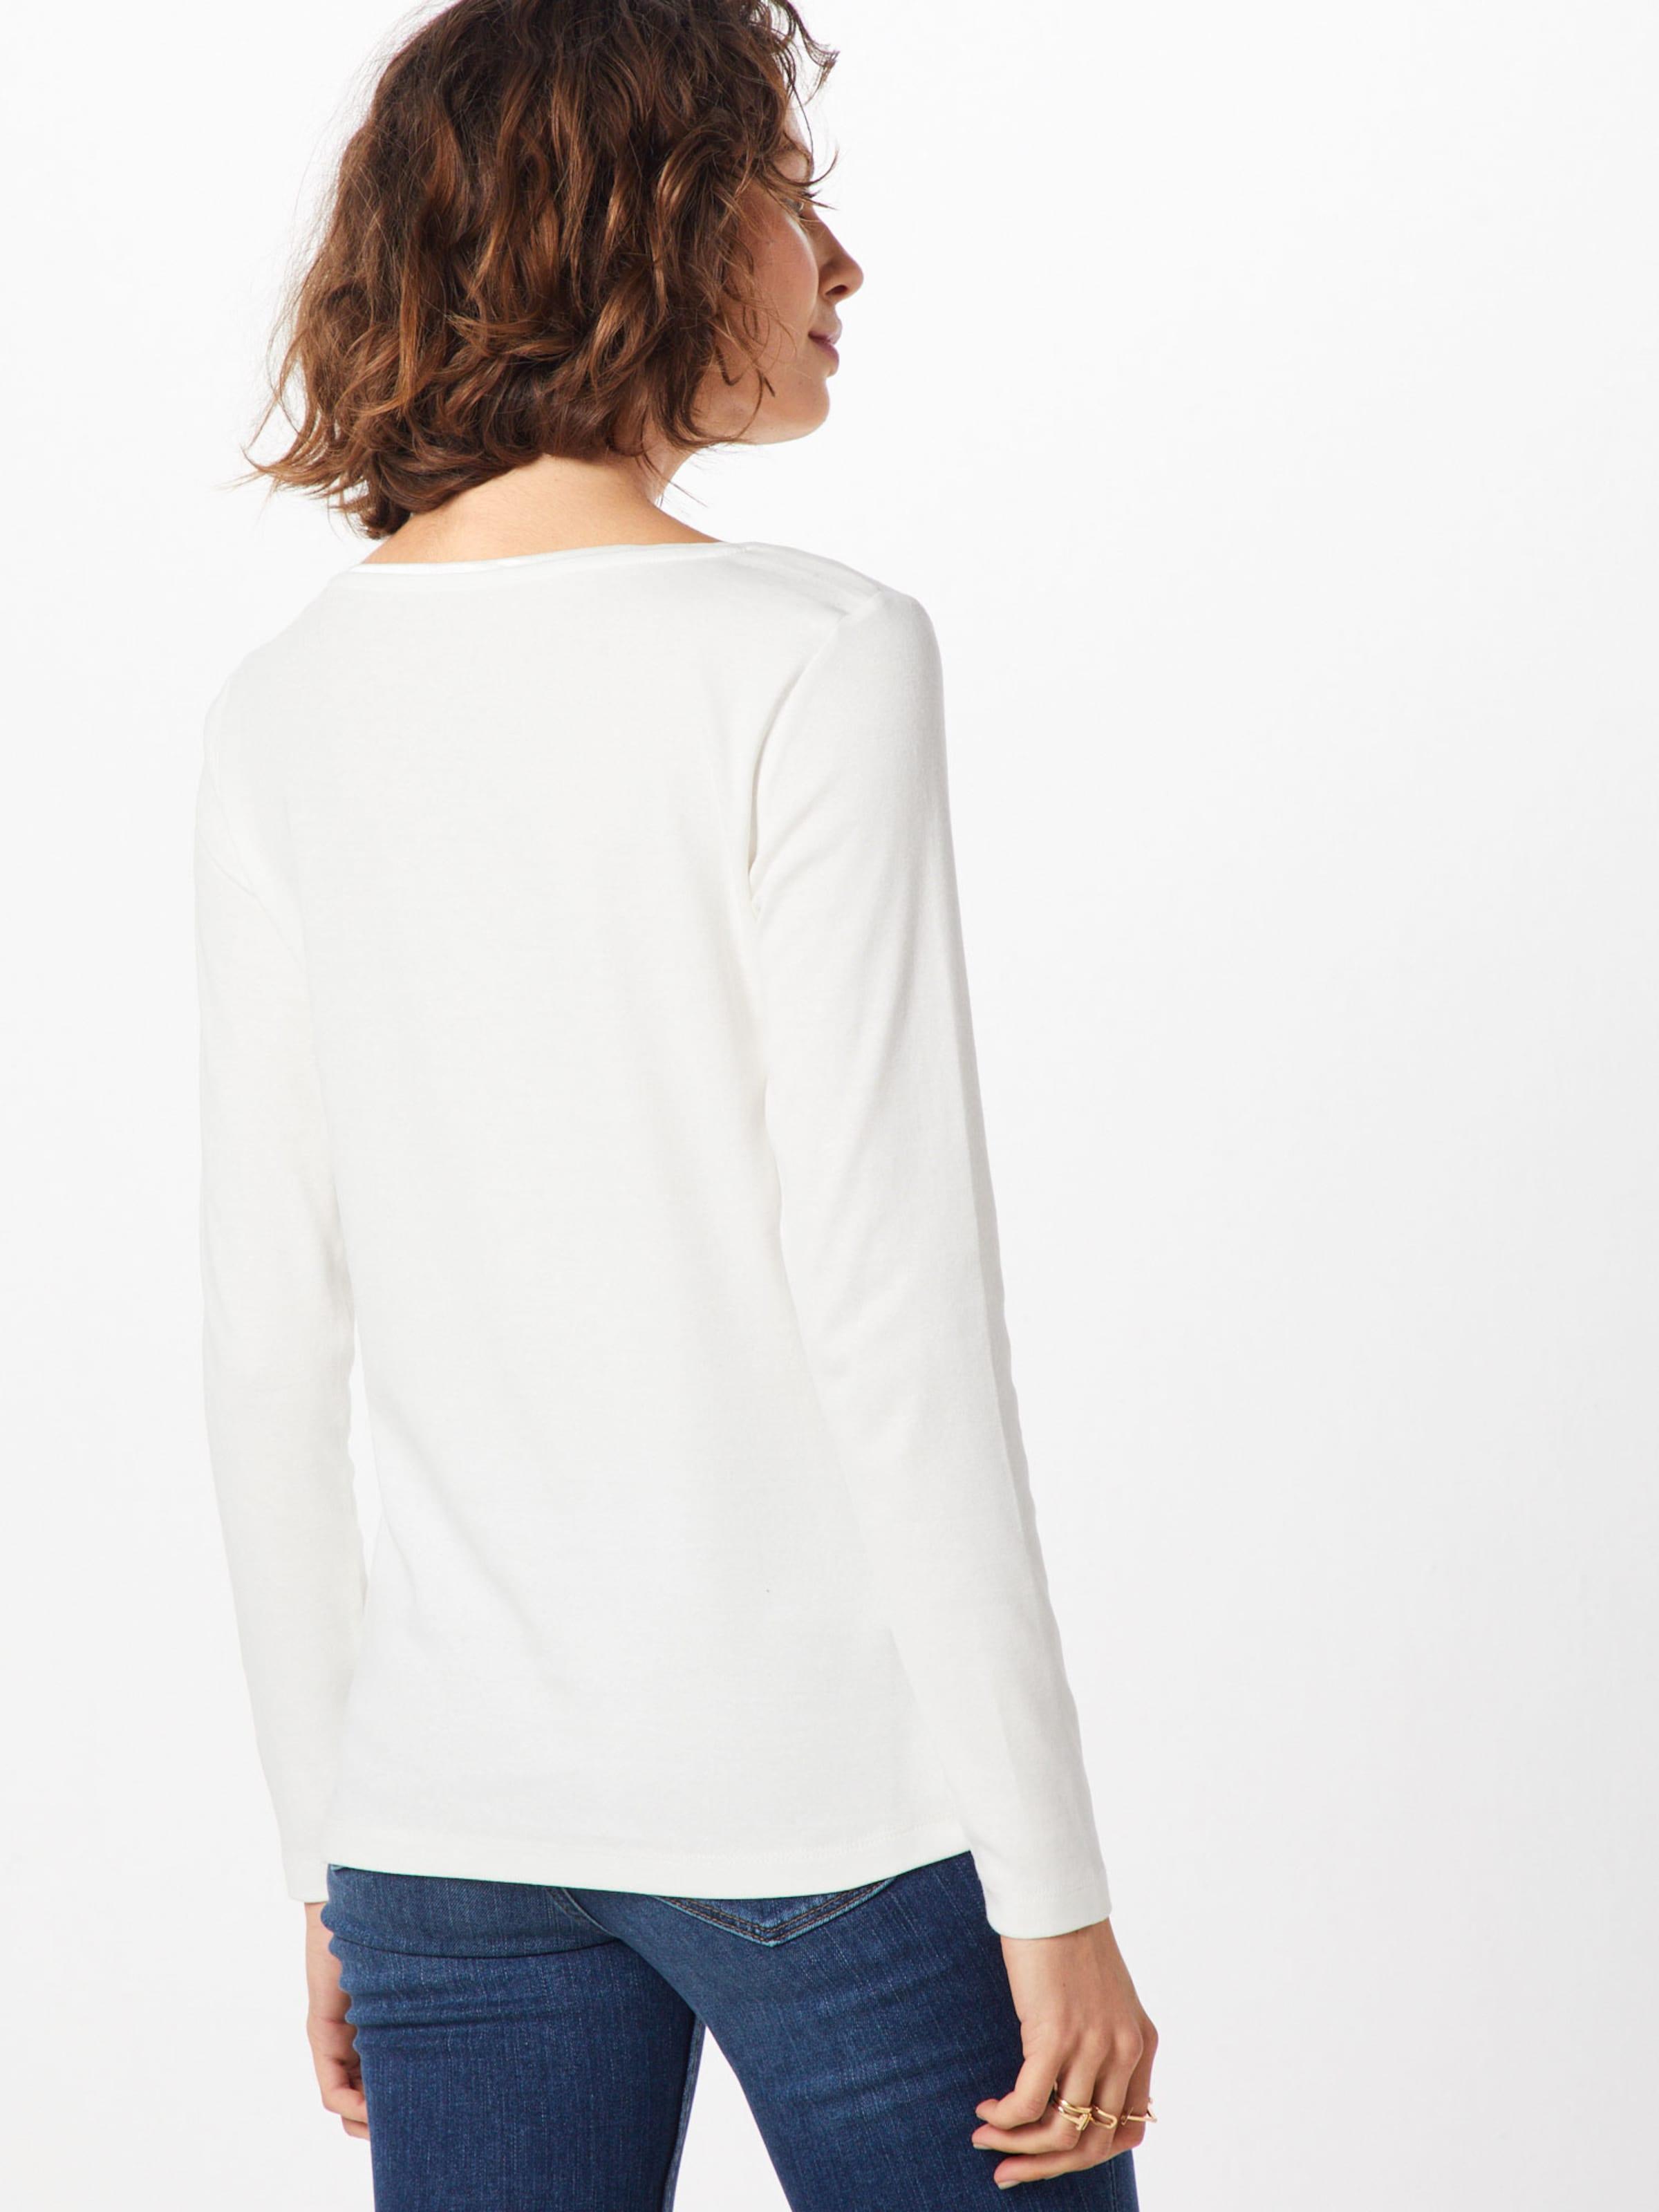 T Blanc Tailor shirt Tom En DIeWH9E2Y